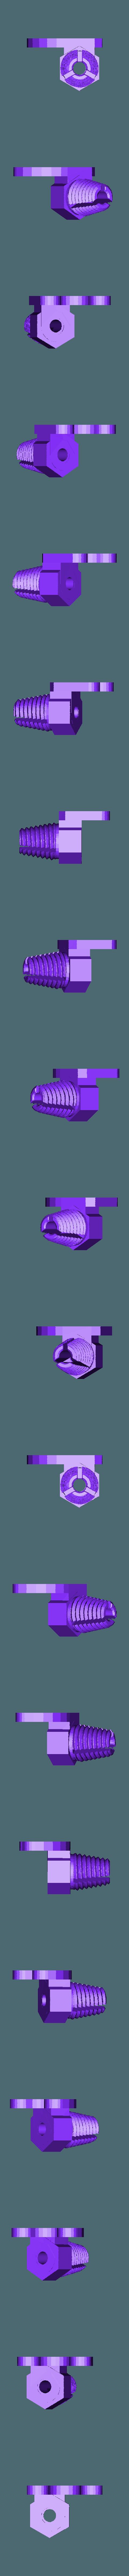 Filament_Guide.stl Download free STL file Ender & CR-10 Filament Guide with built-in locking PTFE tube coupler • 3D printer model, FedorSosnin